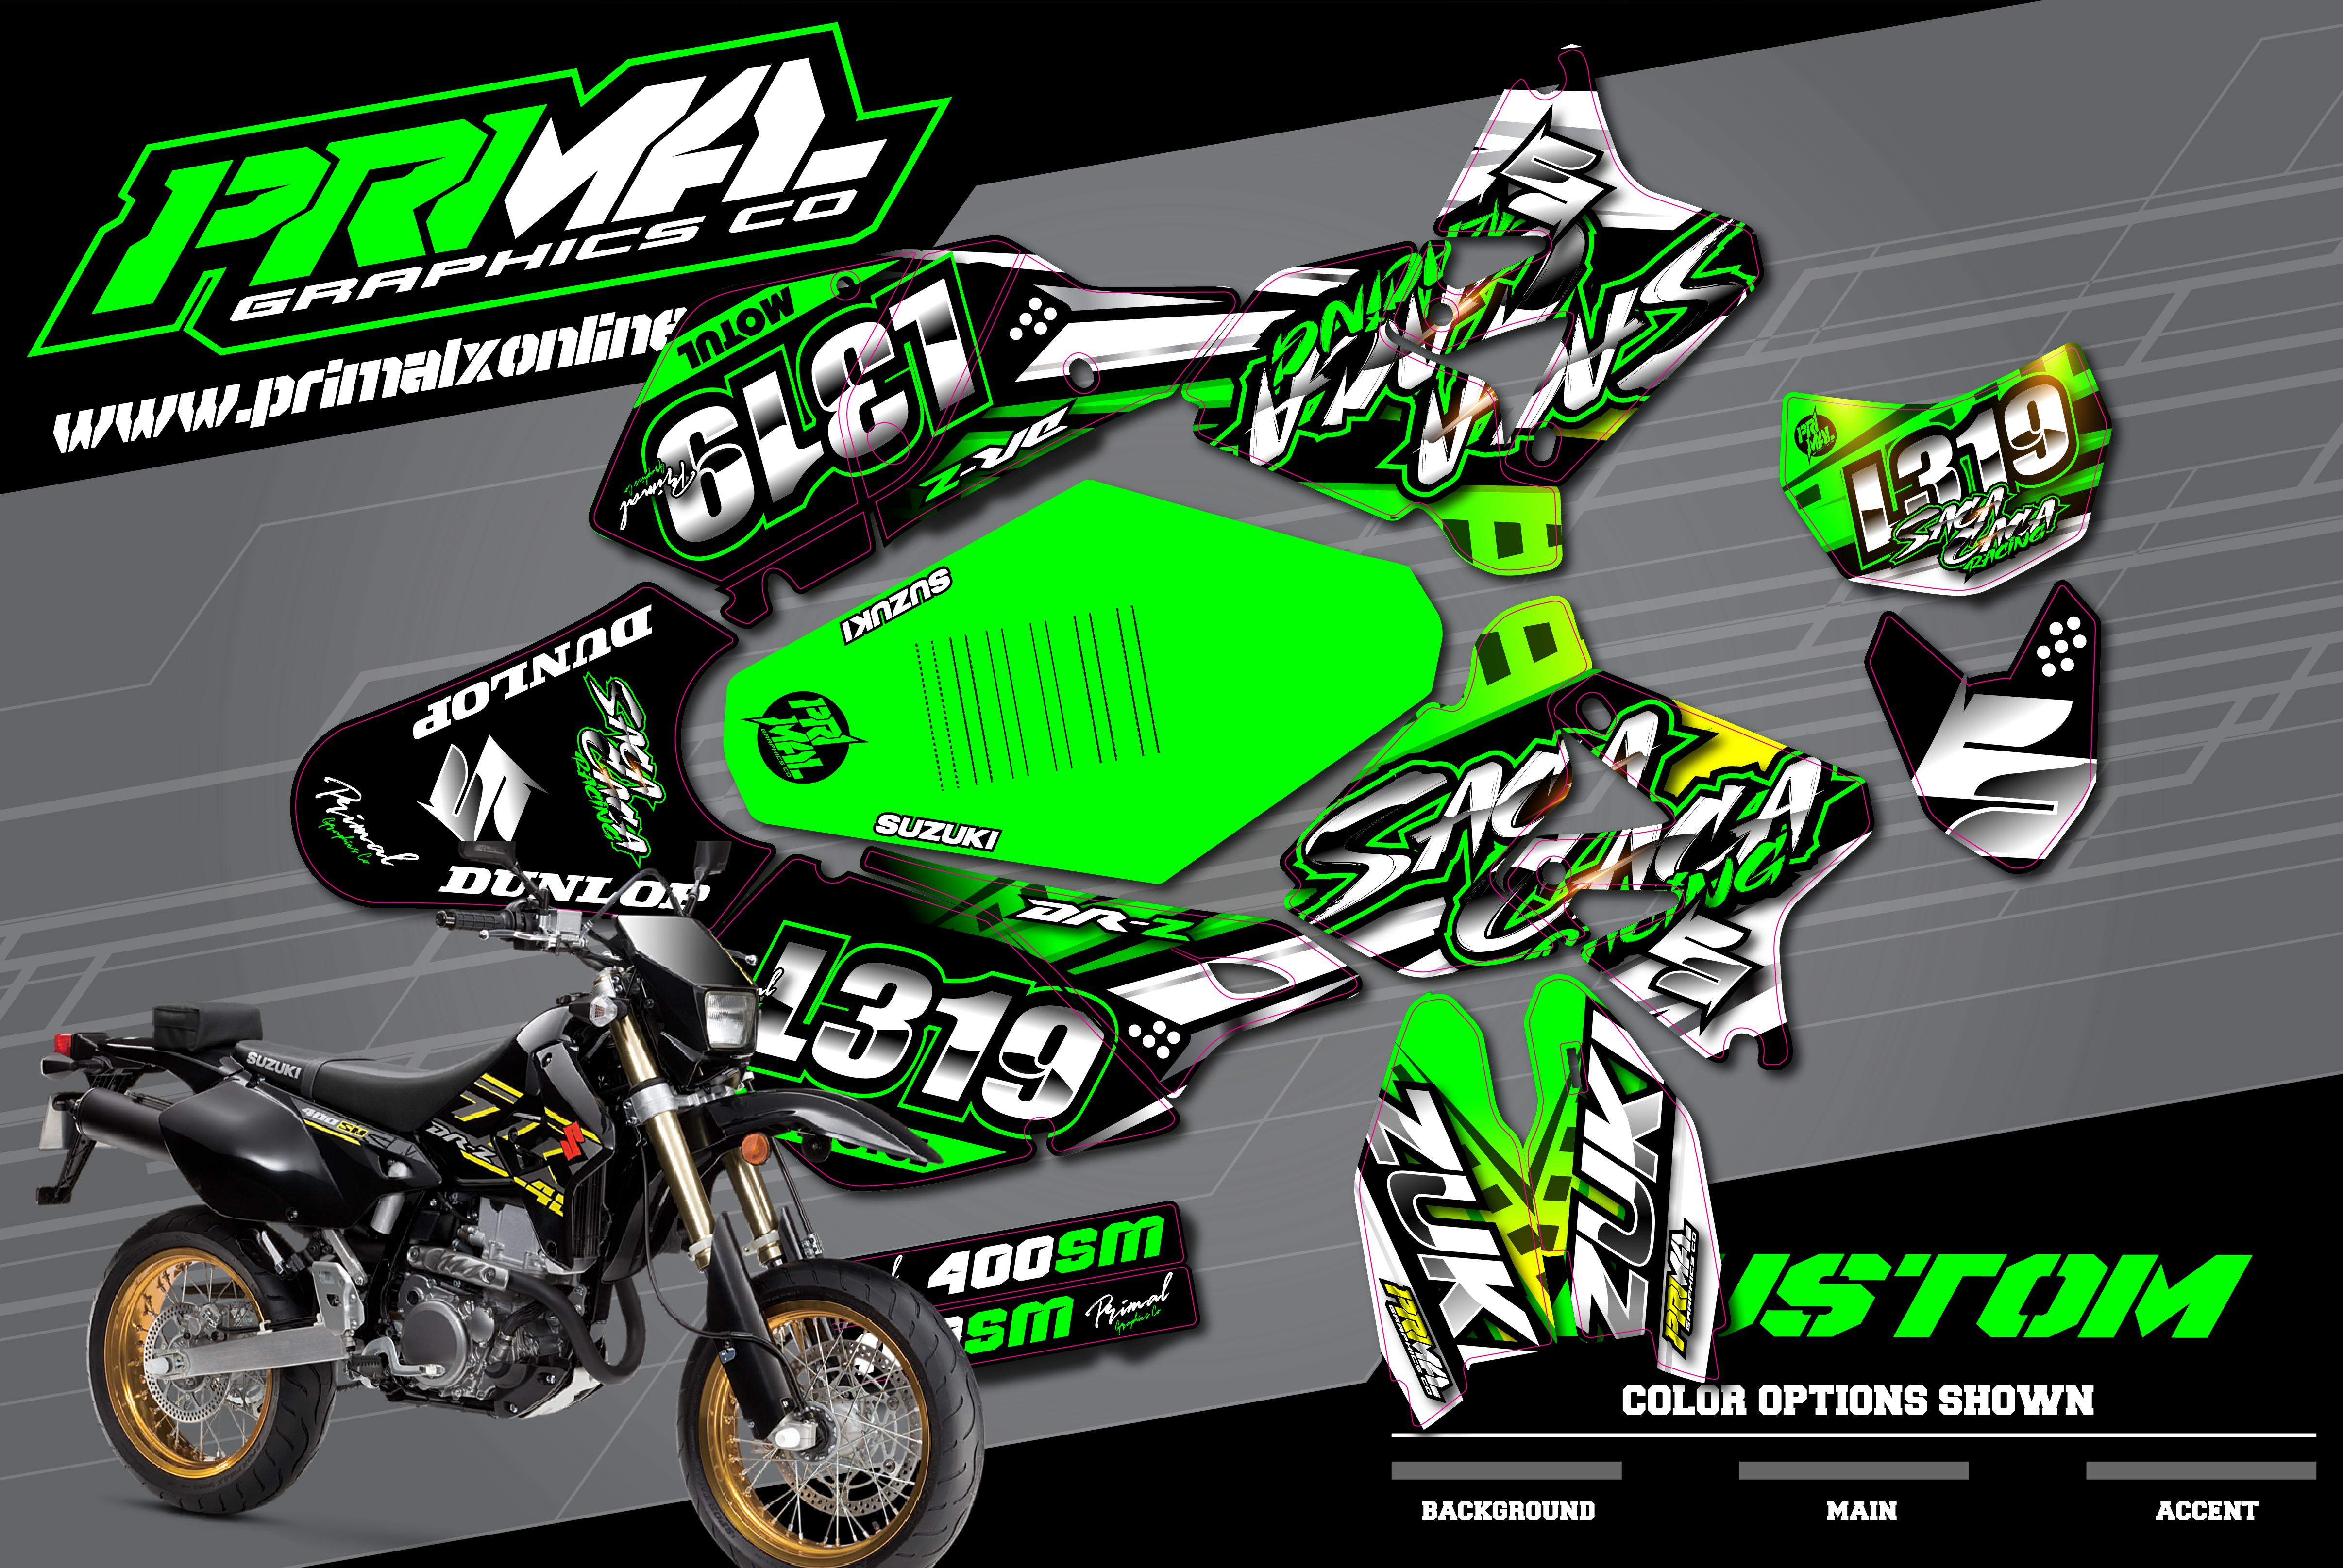 PRIMAL-X-MOTORSPORTS-PRIMAL-GRAPHICS-CO-SUZUKI-DRZ400SM-SUPERMOTO-MOTOCROSS-GRAPHICS-BIKELIFE-CHARMCITY-SACA-CACA-RACING-01